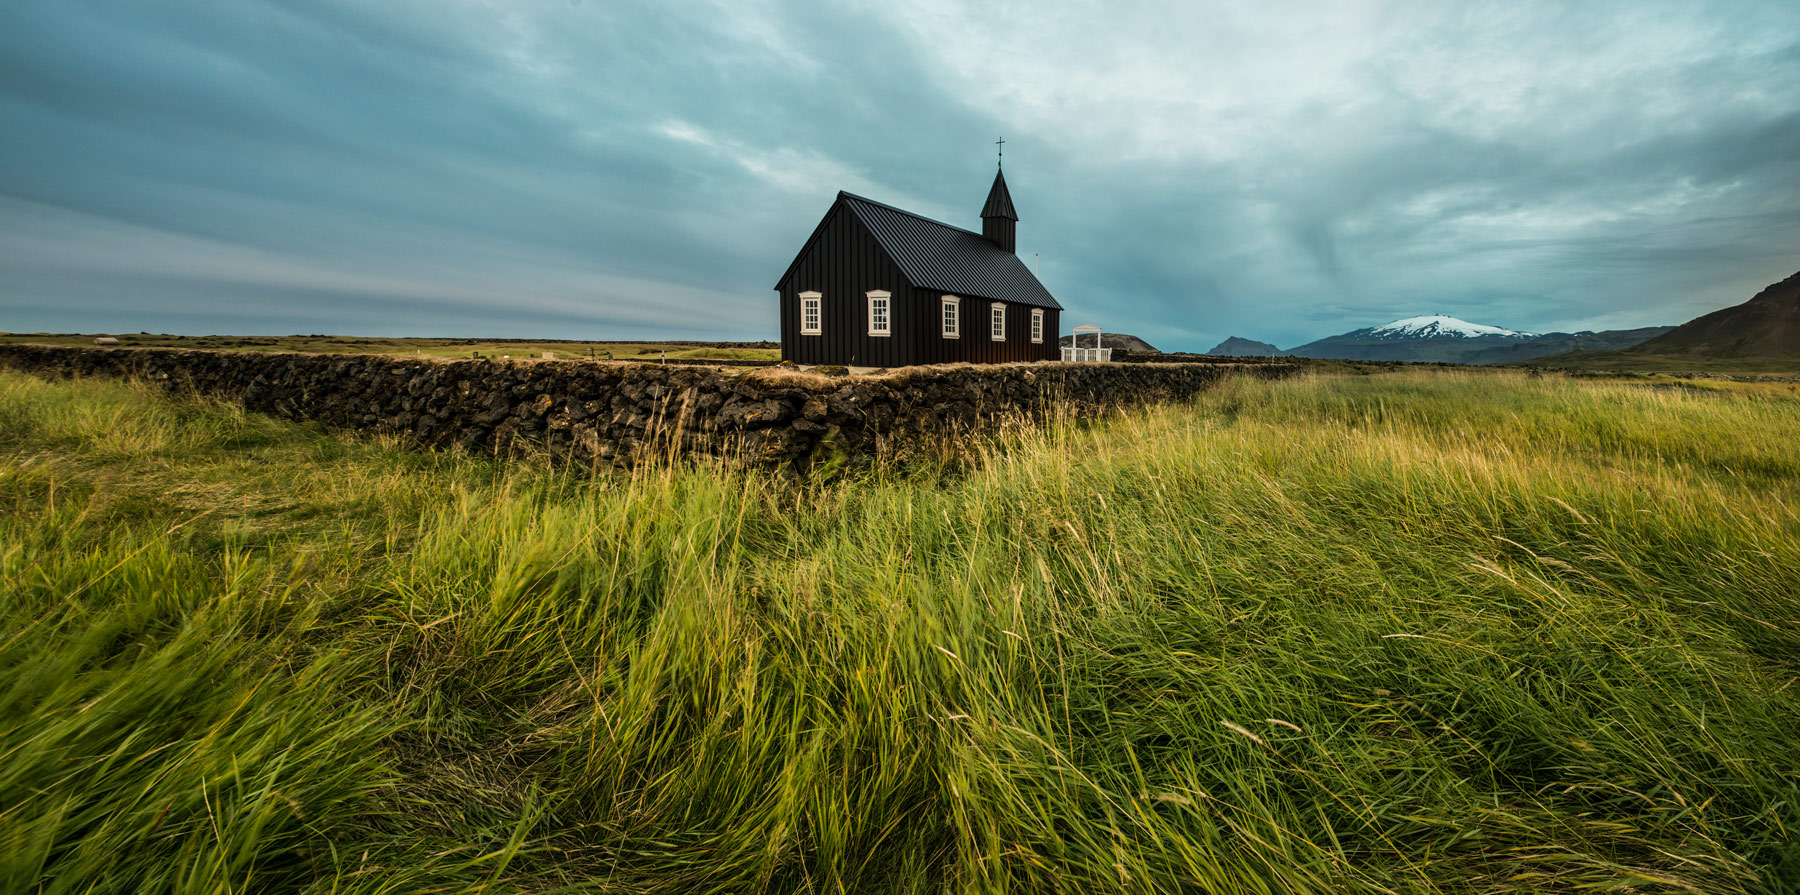 BudirChurchPano_Iceland.jpg